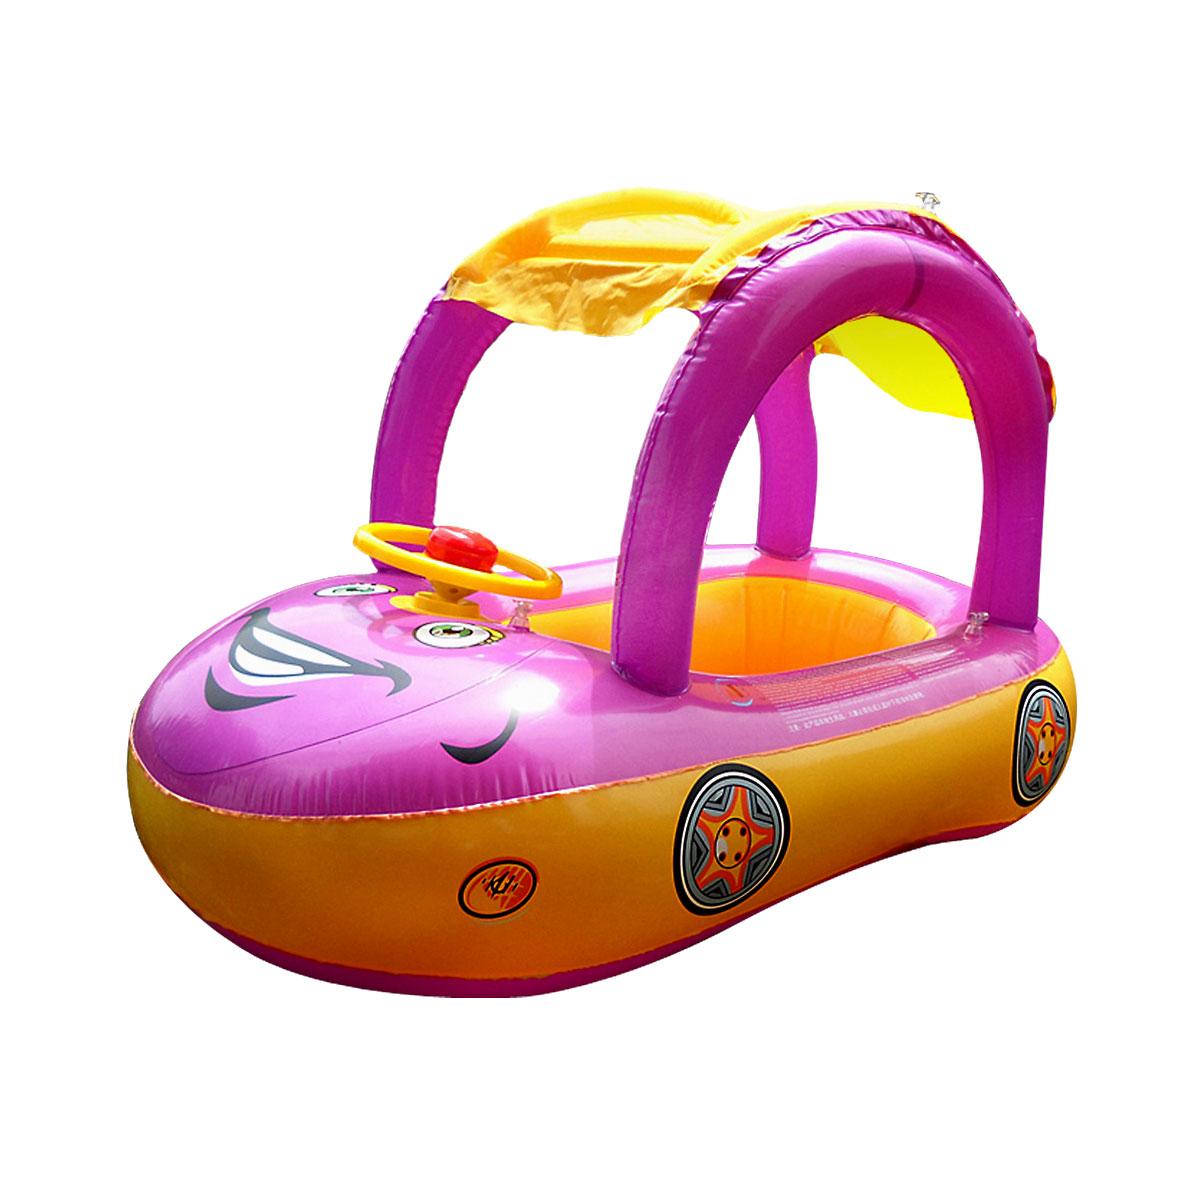 Adjustable Inflatable Baby Float Seat Boat Ring Car Sunshade Swim Pool Water Fun Ebay